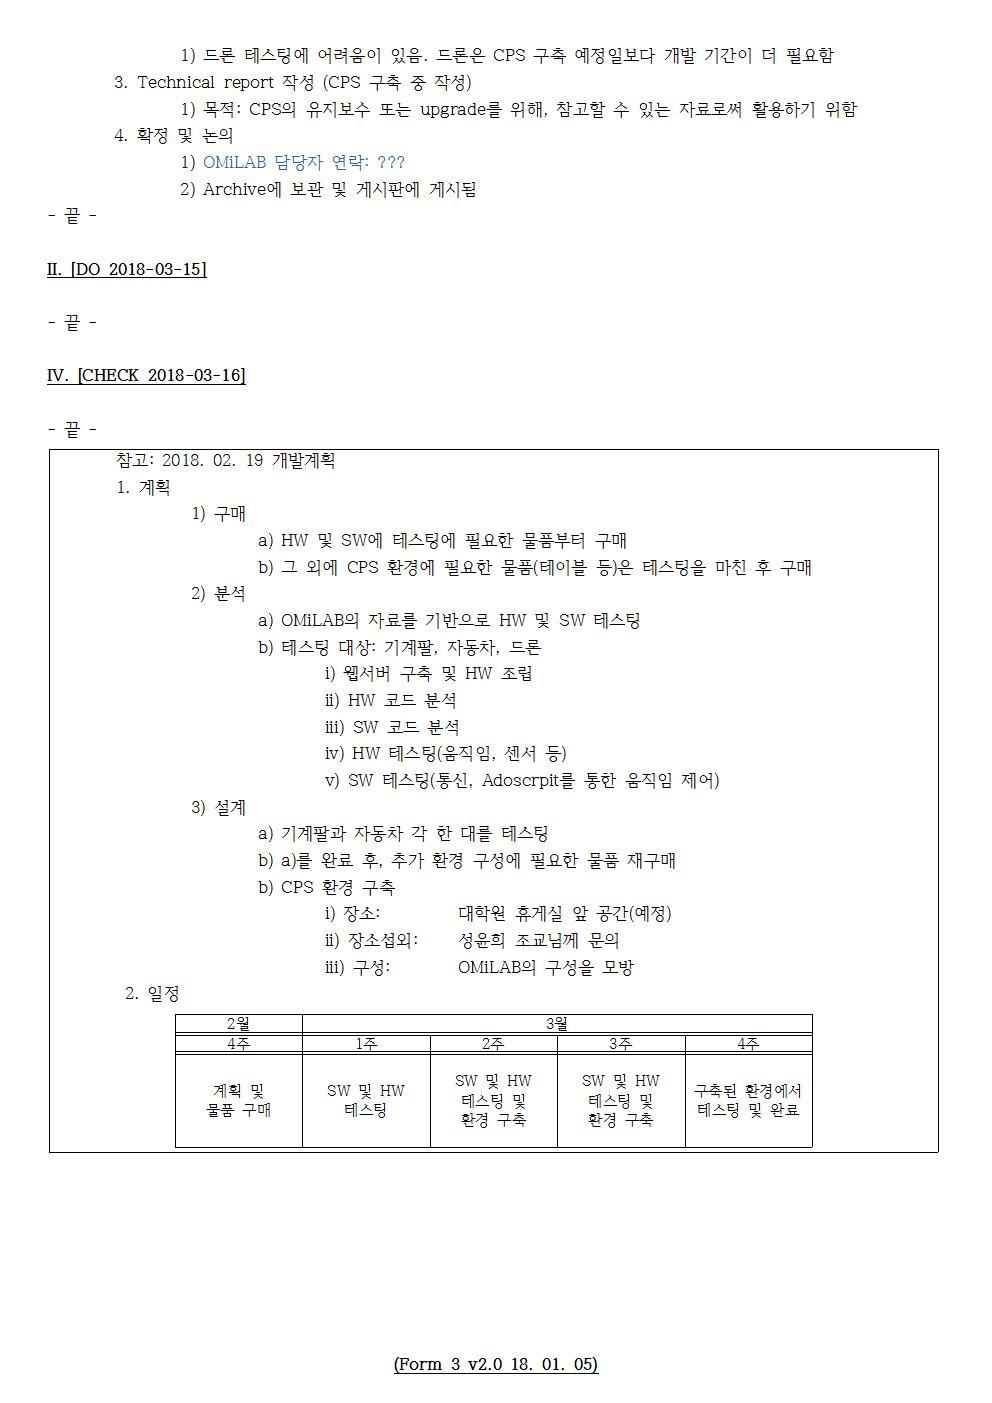 D-[18-037-RC-07]-[3L-CPS]-[2018-03-19][SH]002.jpg